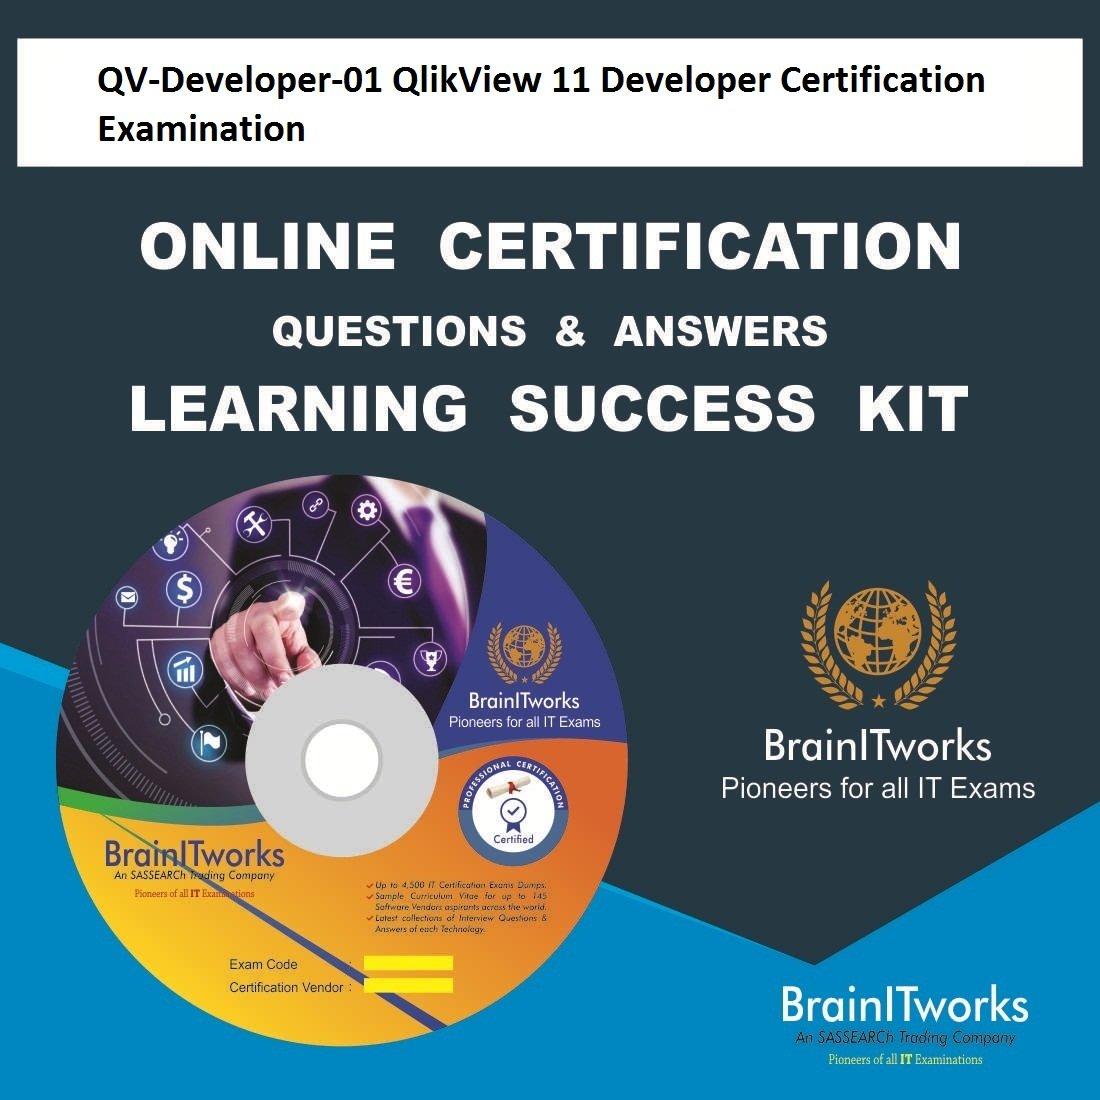 Amazon Qv Developer 01 Qlikview 11 Developer Certification